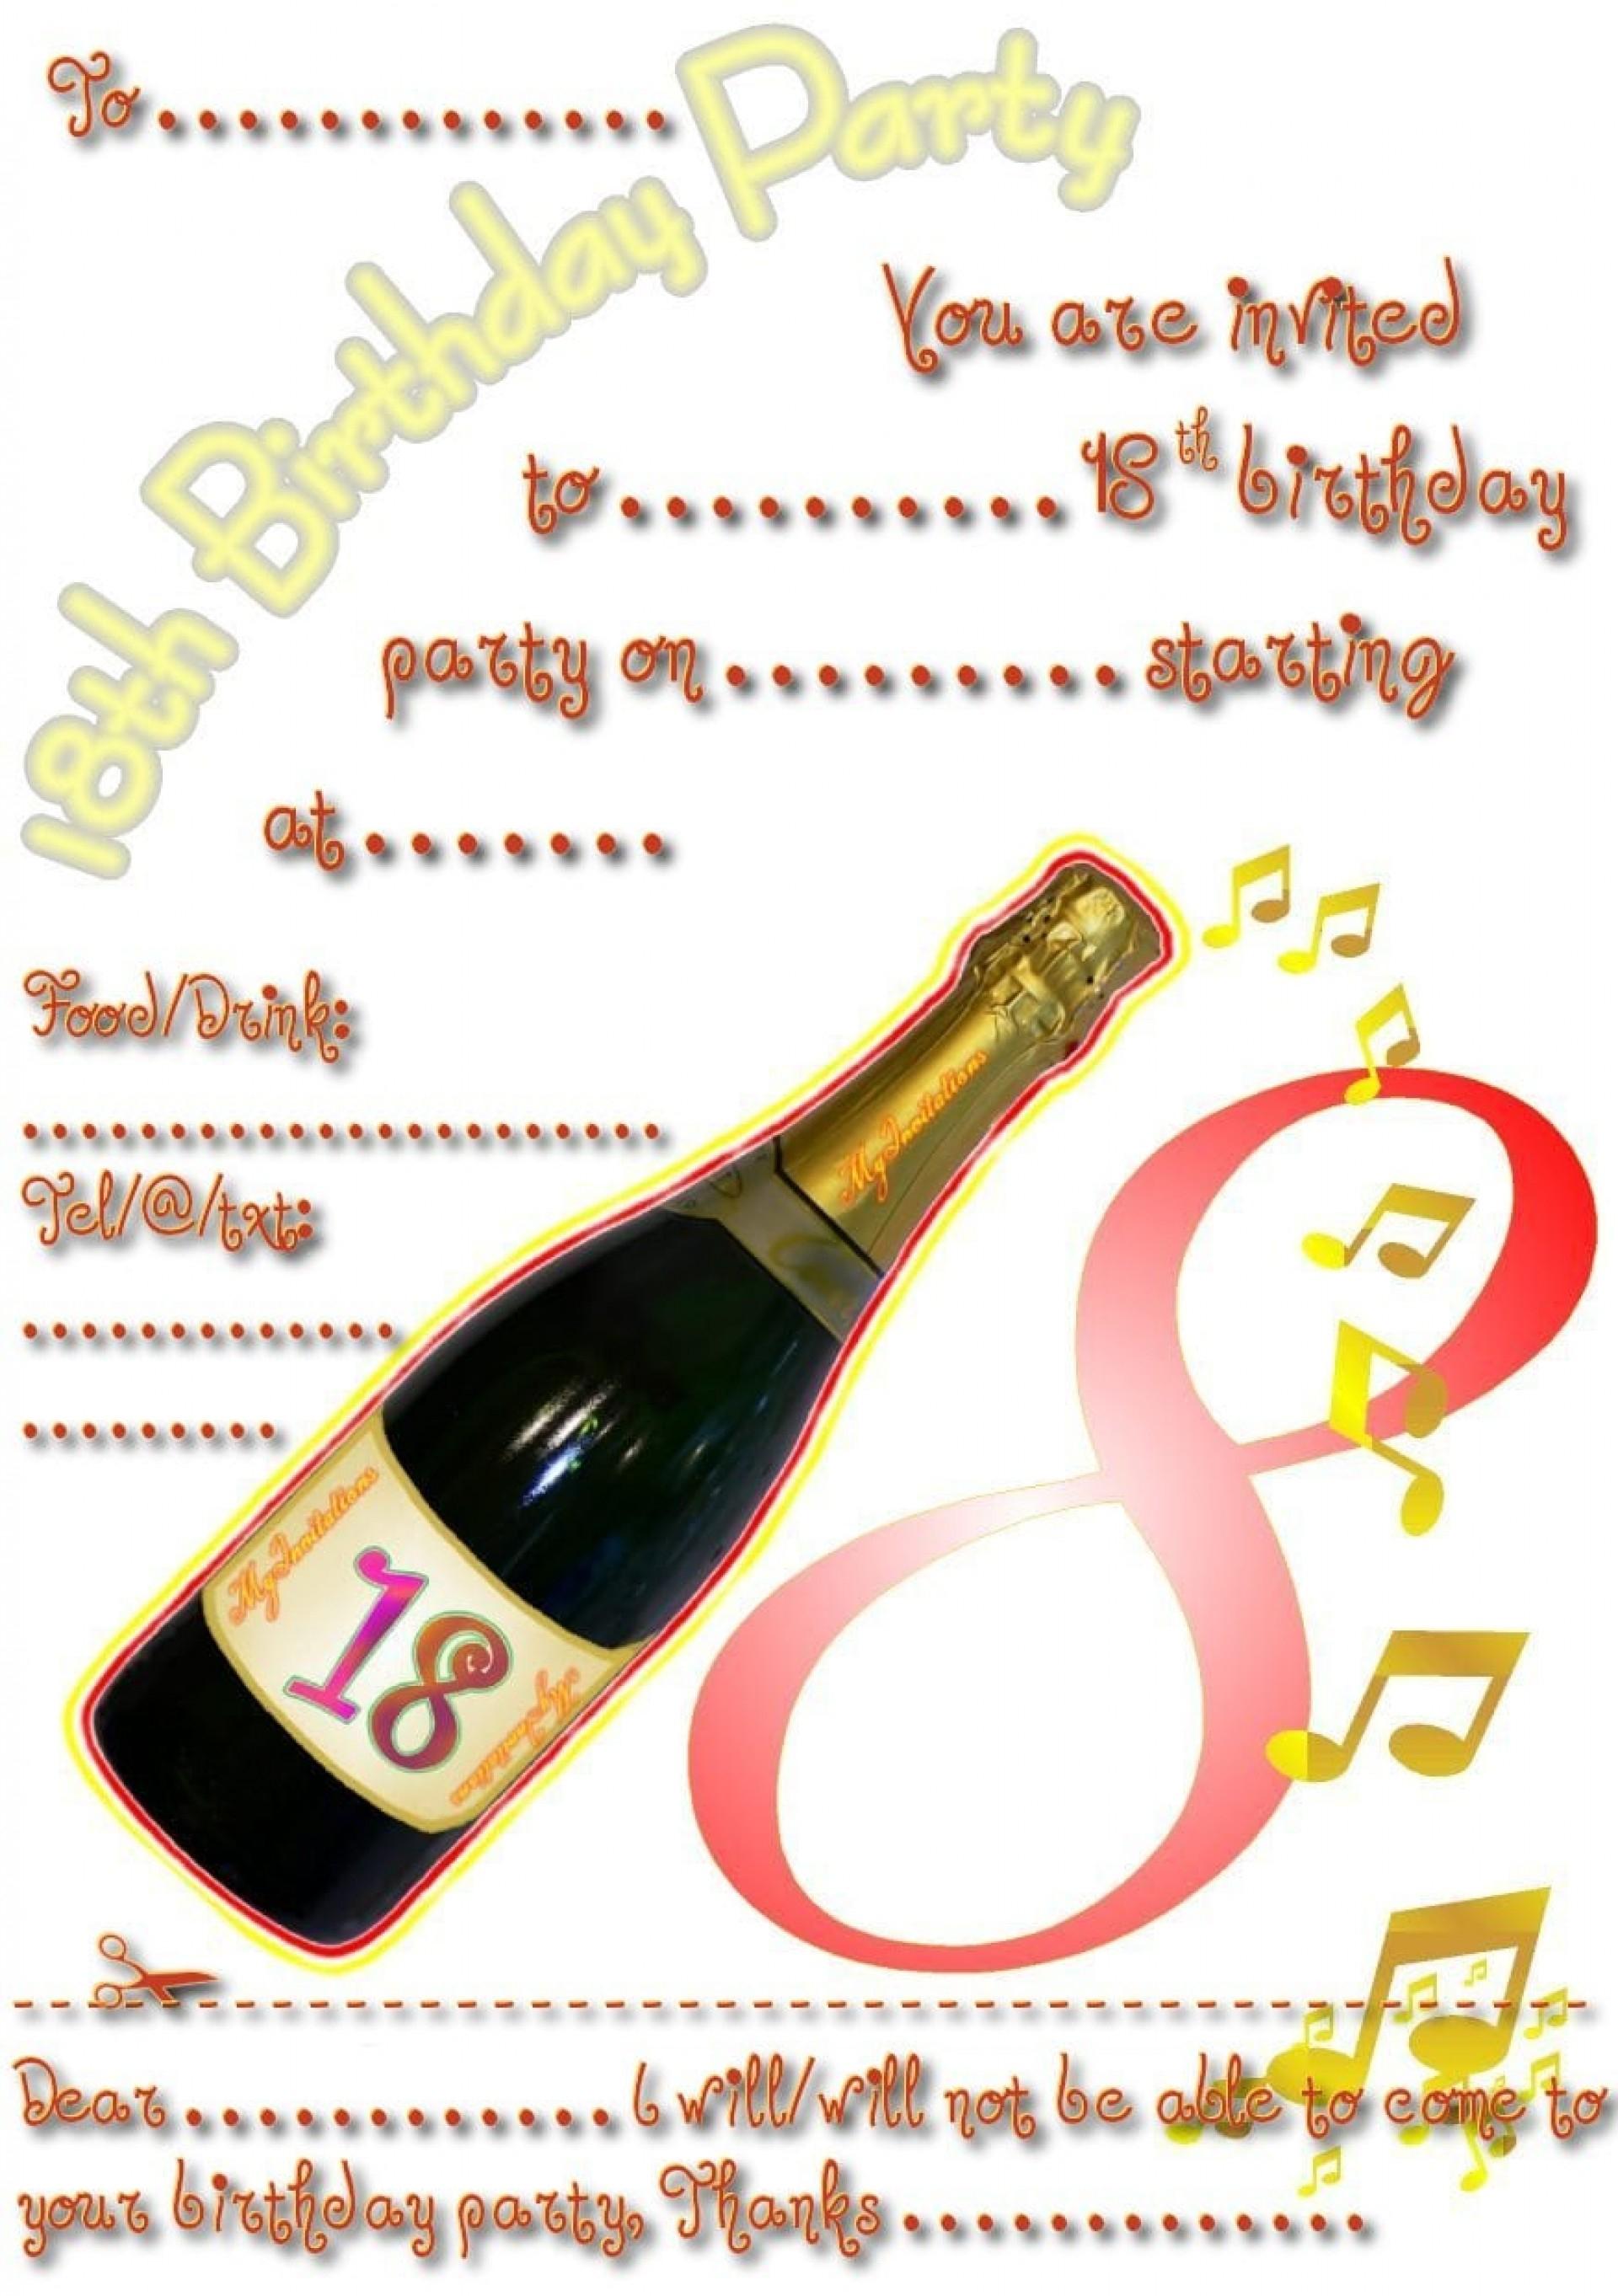 009 18Th Birthday Invitation Templates Free Printable Party Template - Free Printable 18Th Birthday Invitations